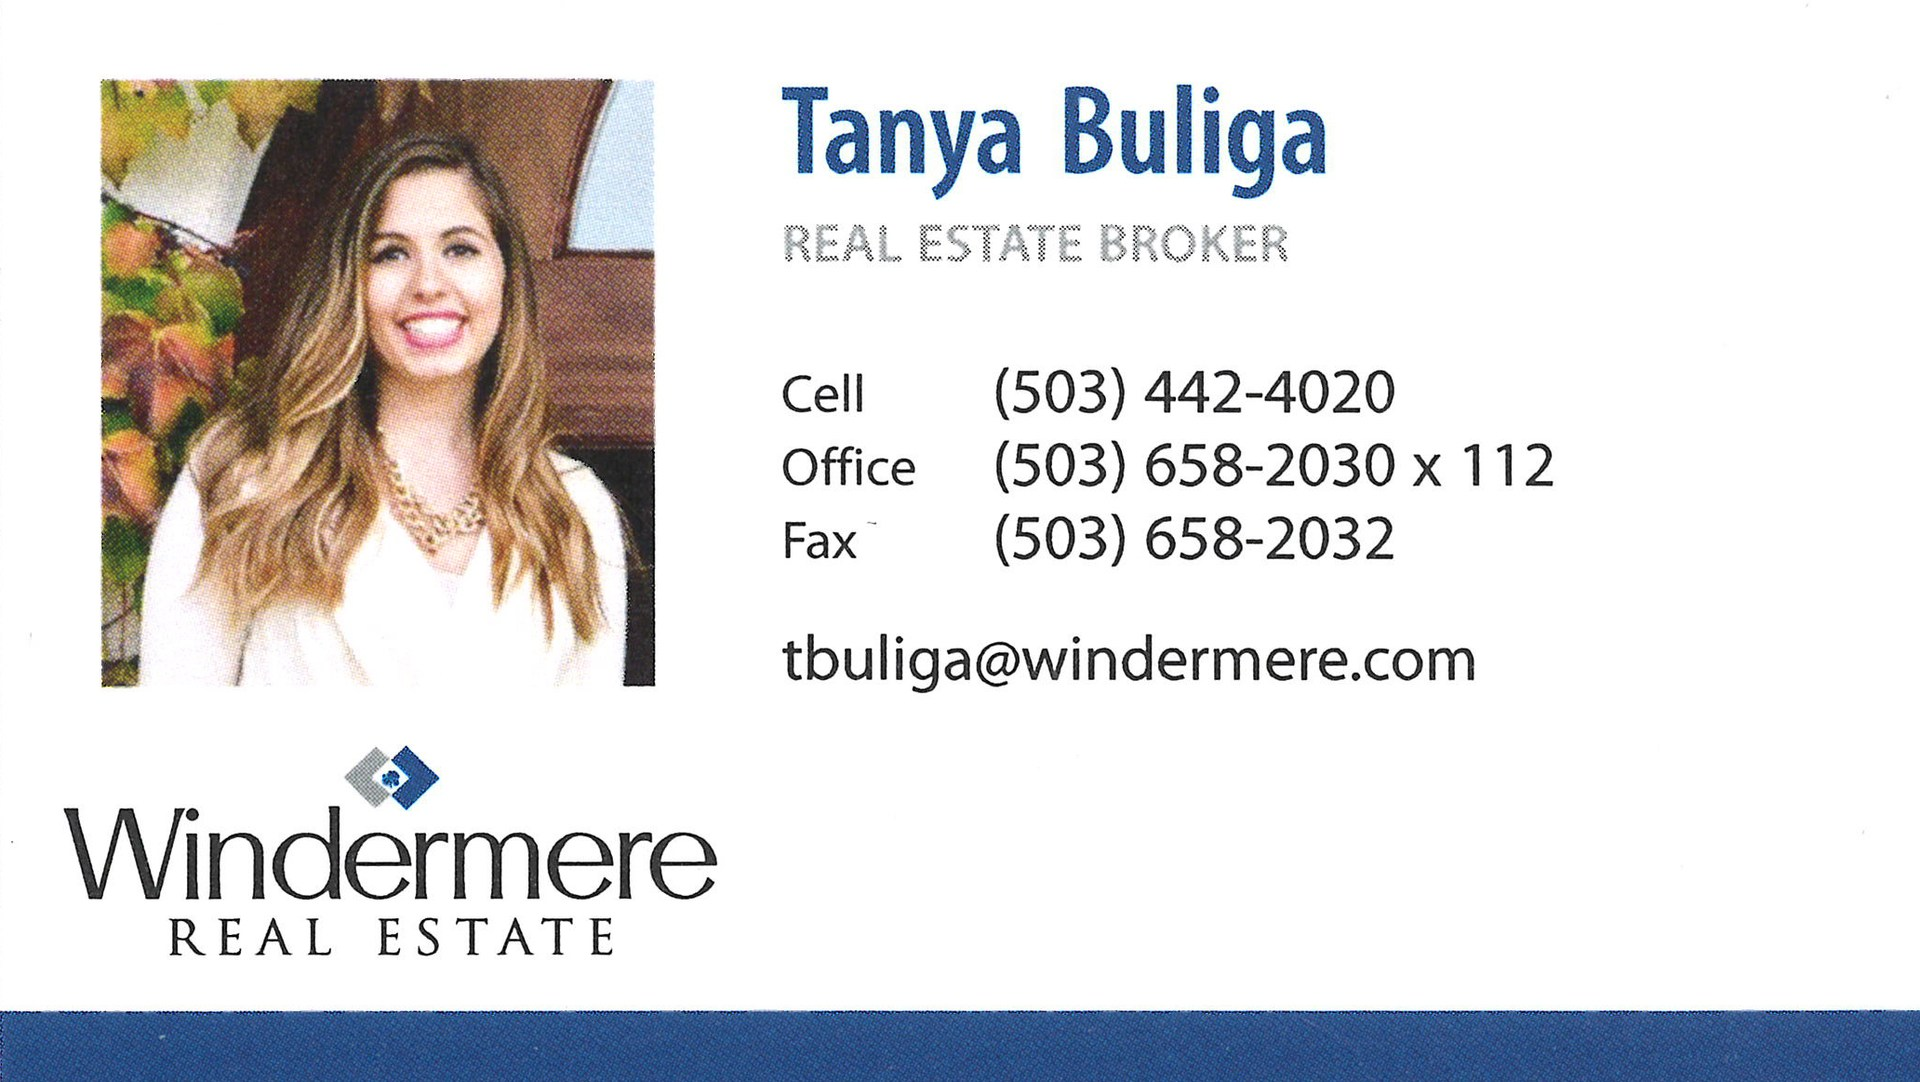 Tanya Buliga-Windemere logo